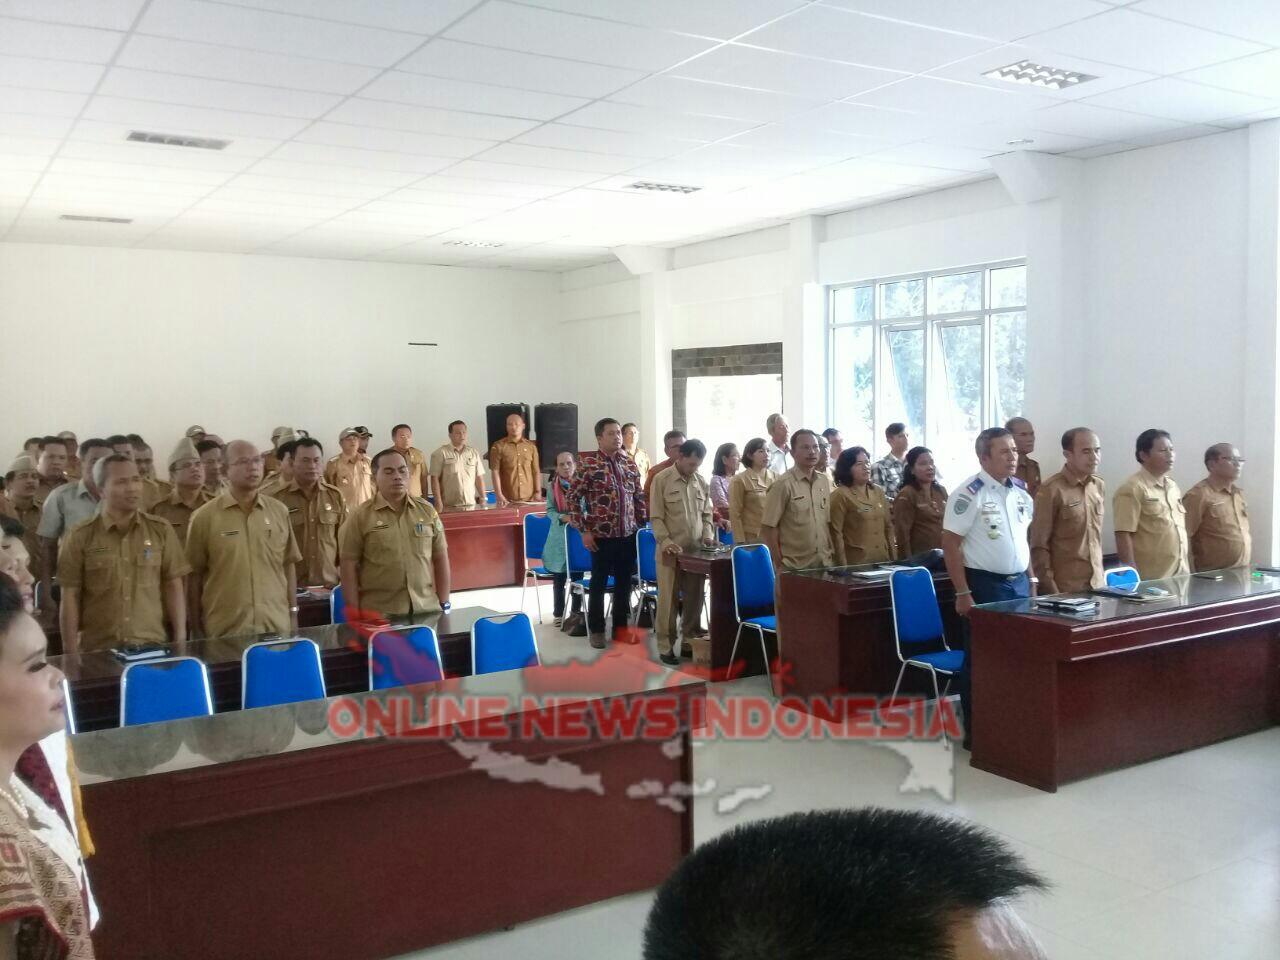 Foto : Pimpinan OPD dan Pejabat Administrator maupun ASN ikut hadir pada pelantikan empat pejabat tinggi pratama di Aula Kantor Bupati